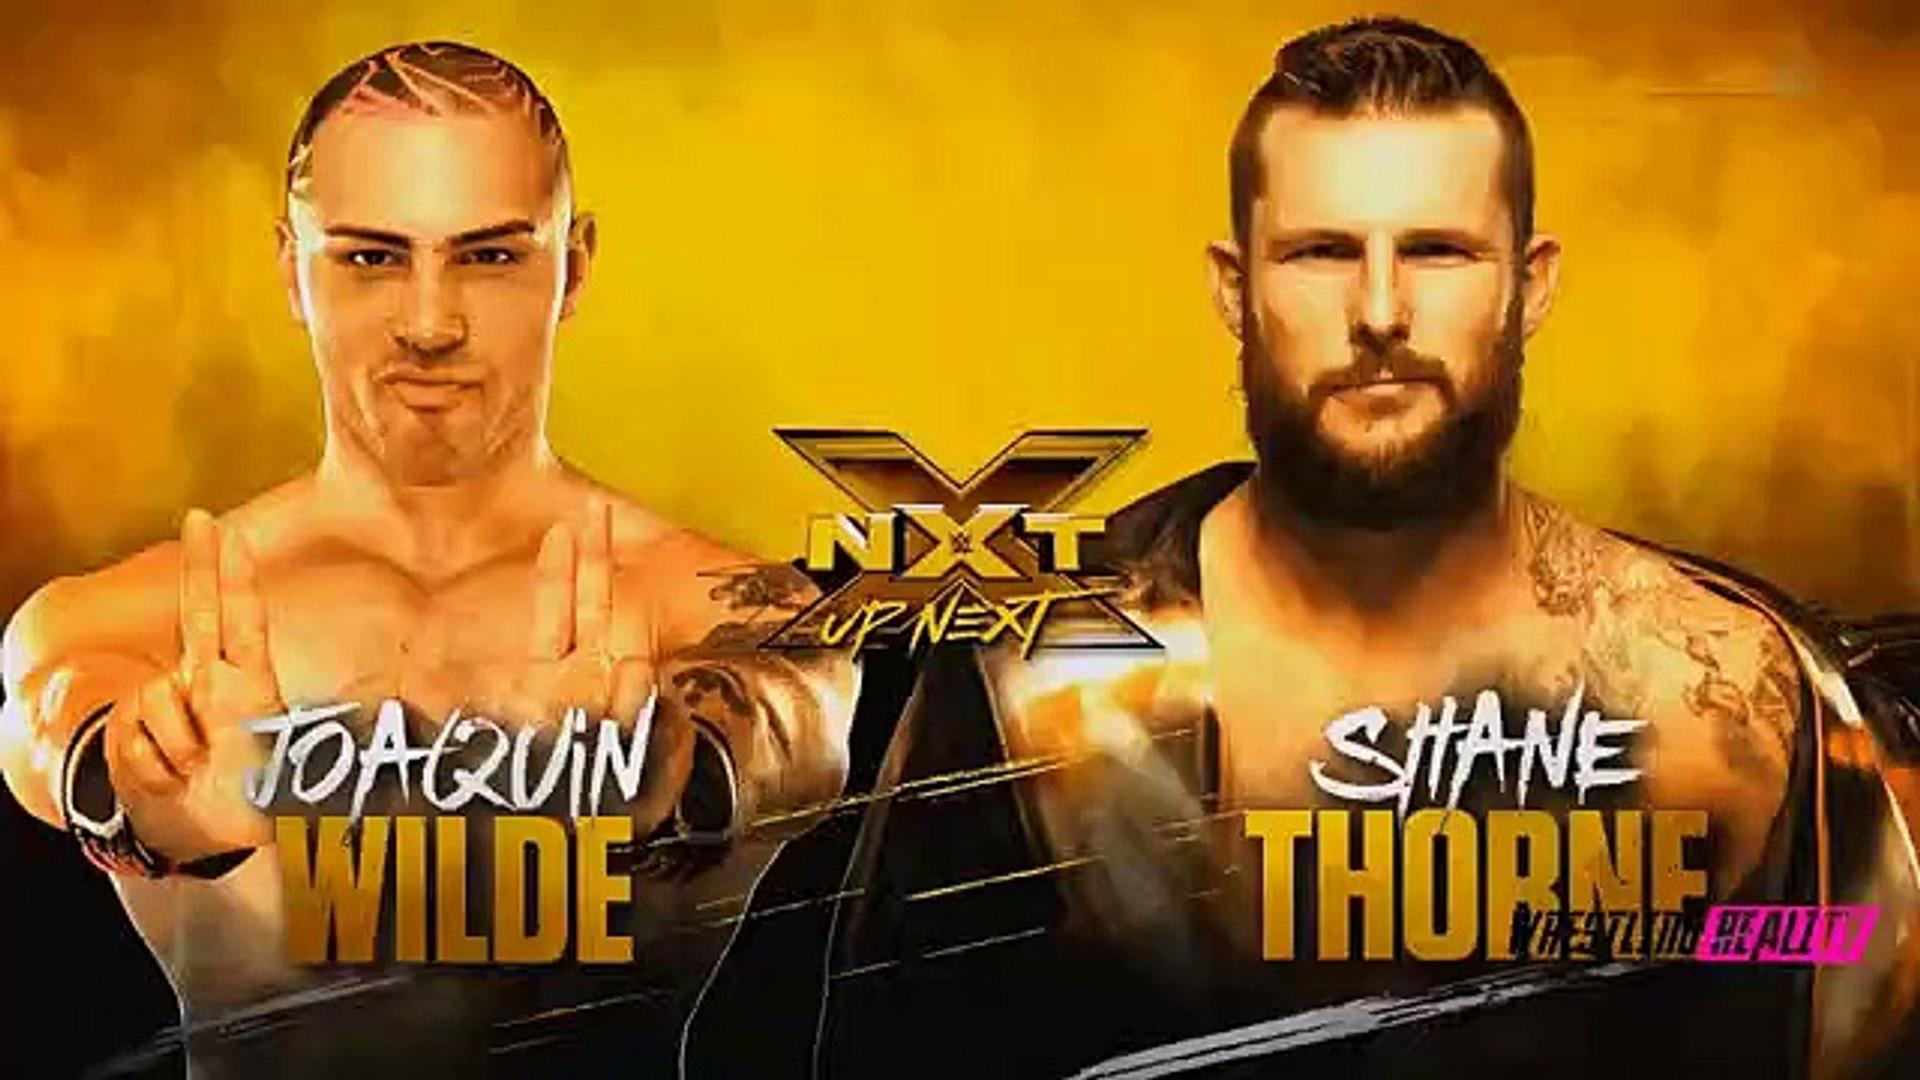 WWE NXT 7th August Highlights HD - WWE NXT Highlight 08-07-19